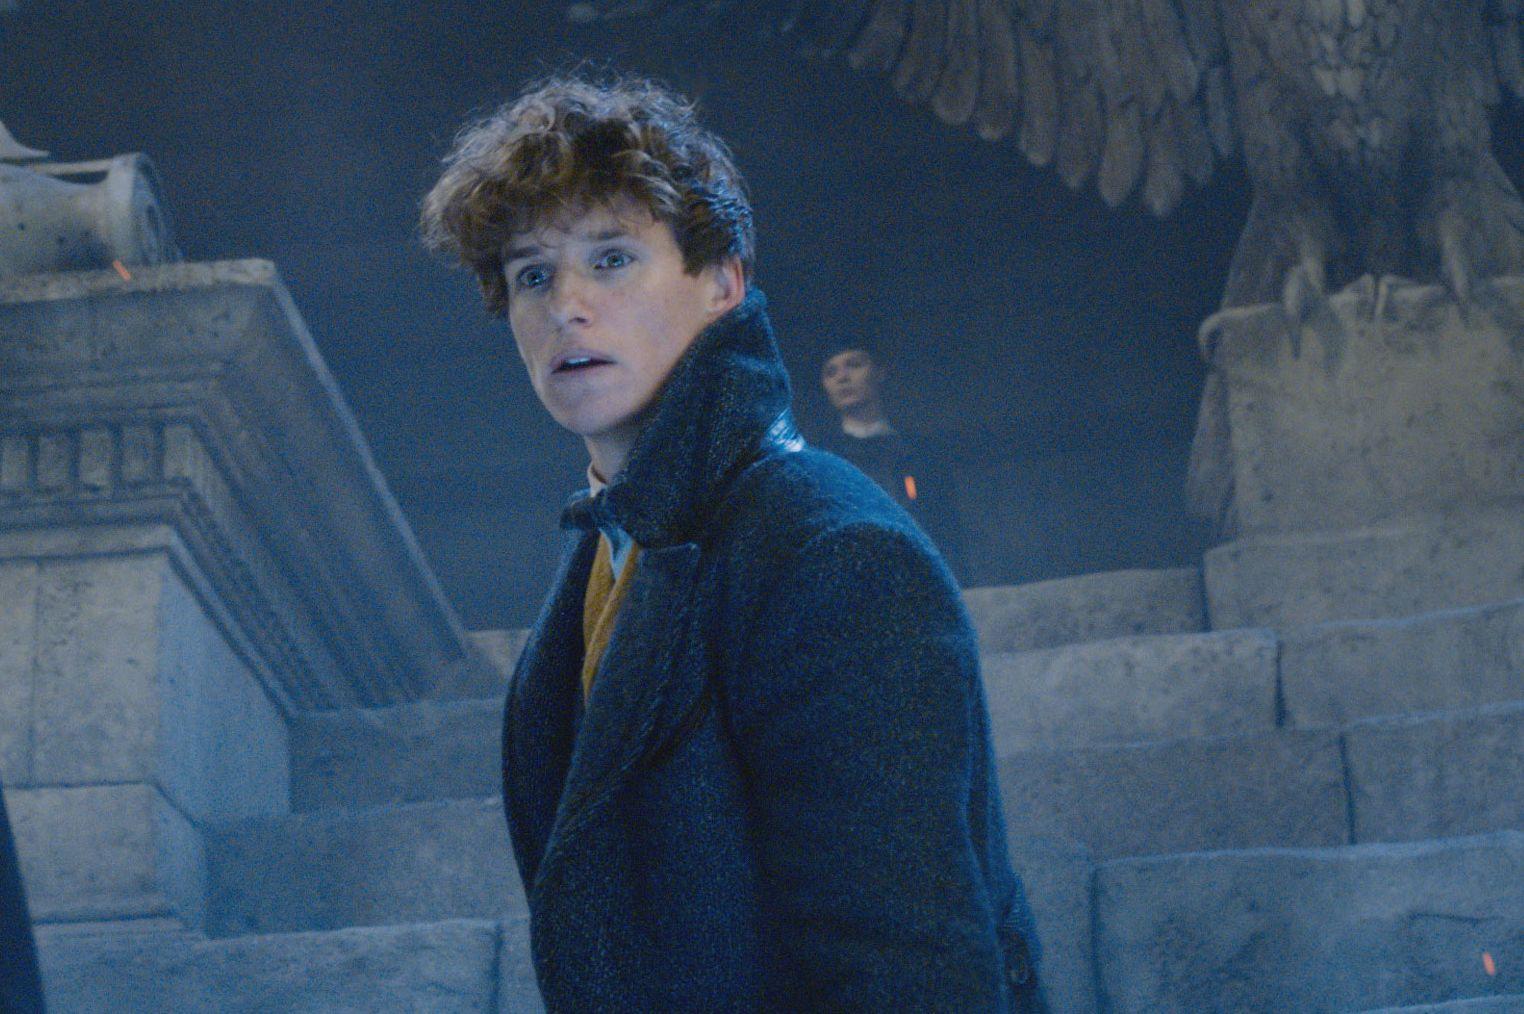 Eddie Redmayne, Callum Turner, Theseus Scamander, Newt Scamander, Fantastic Beasts: The Crimes of Grindelwald